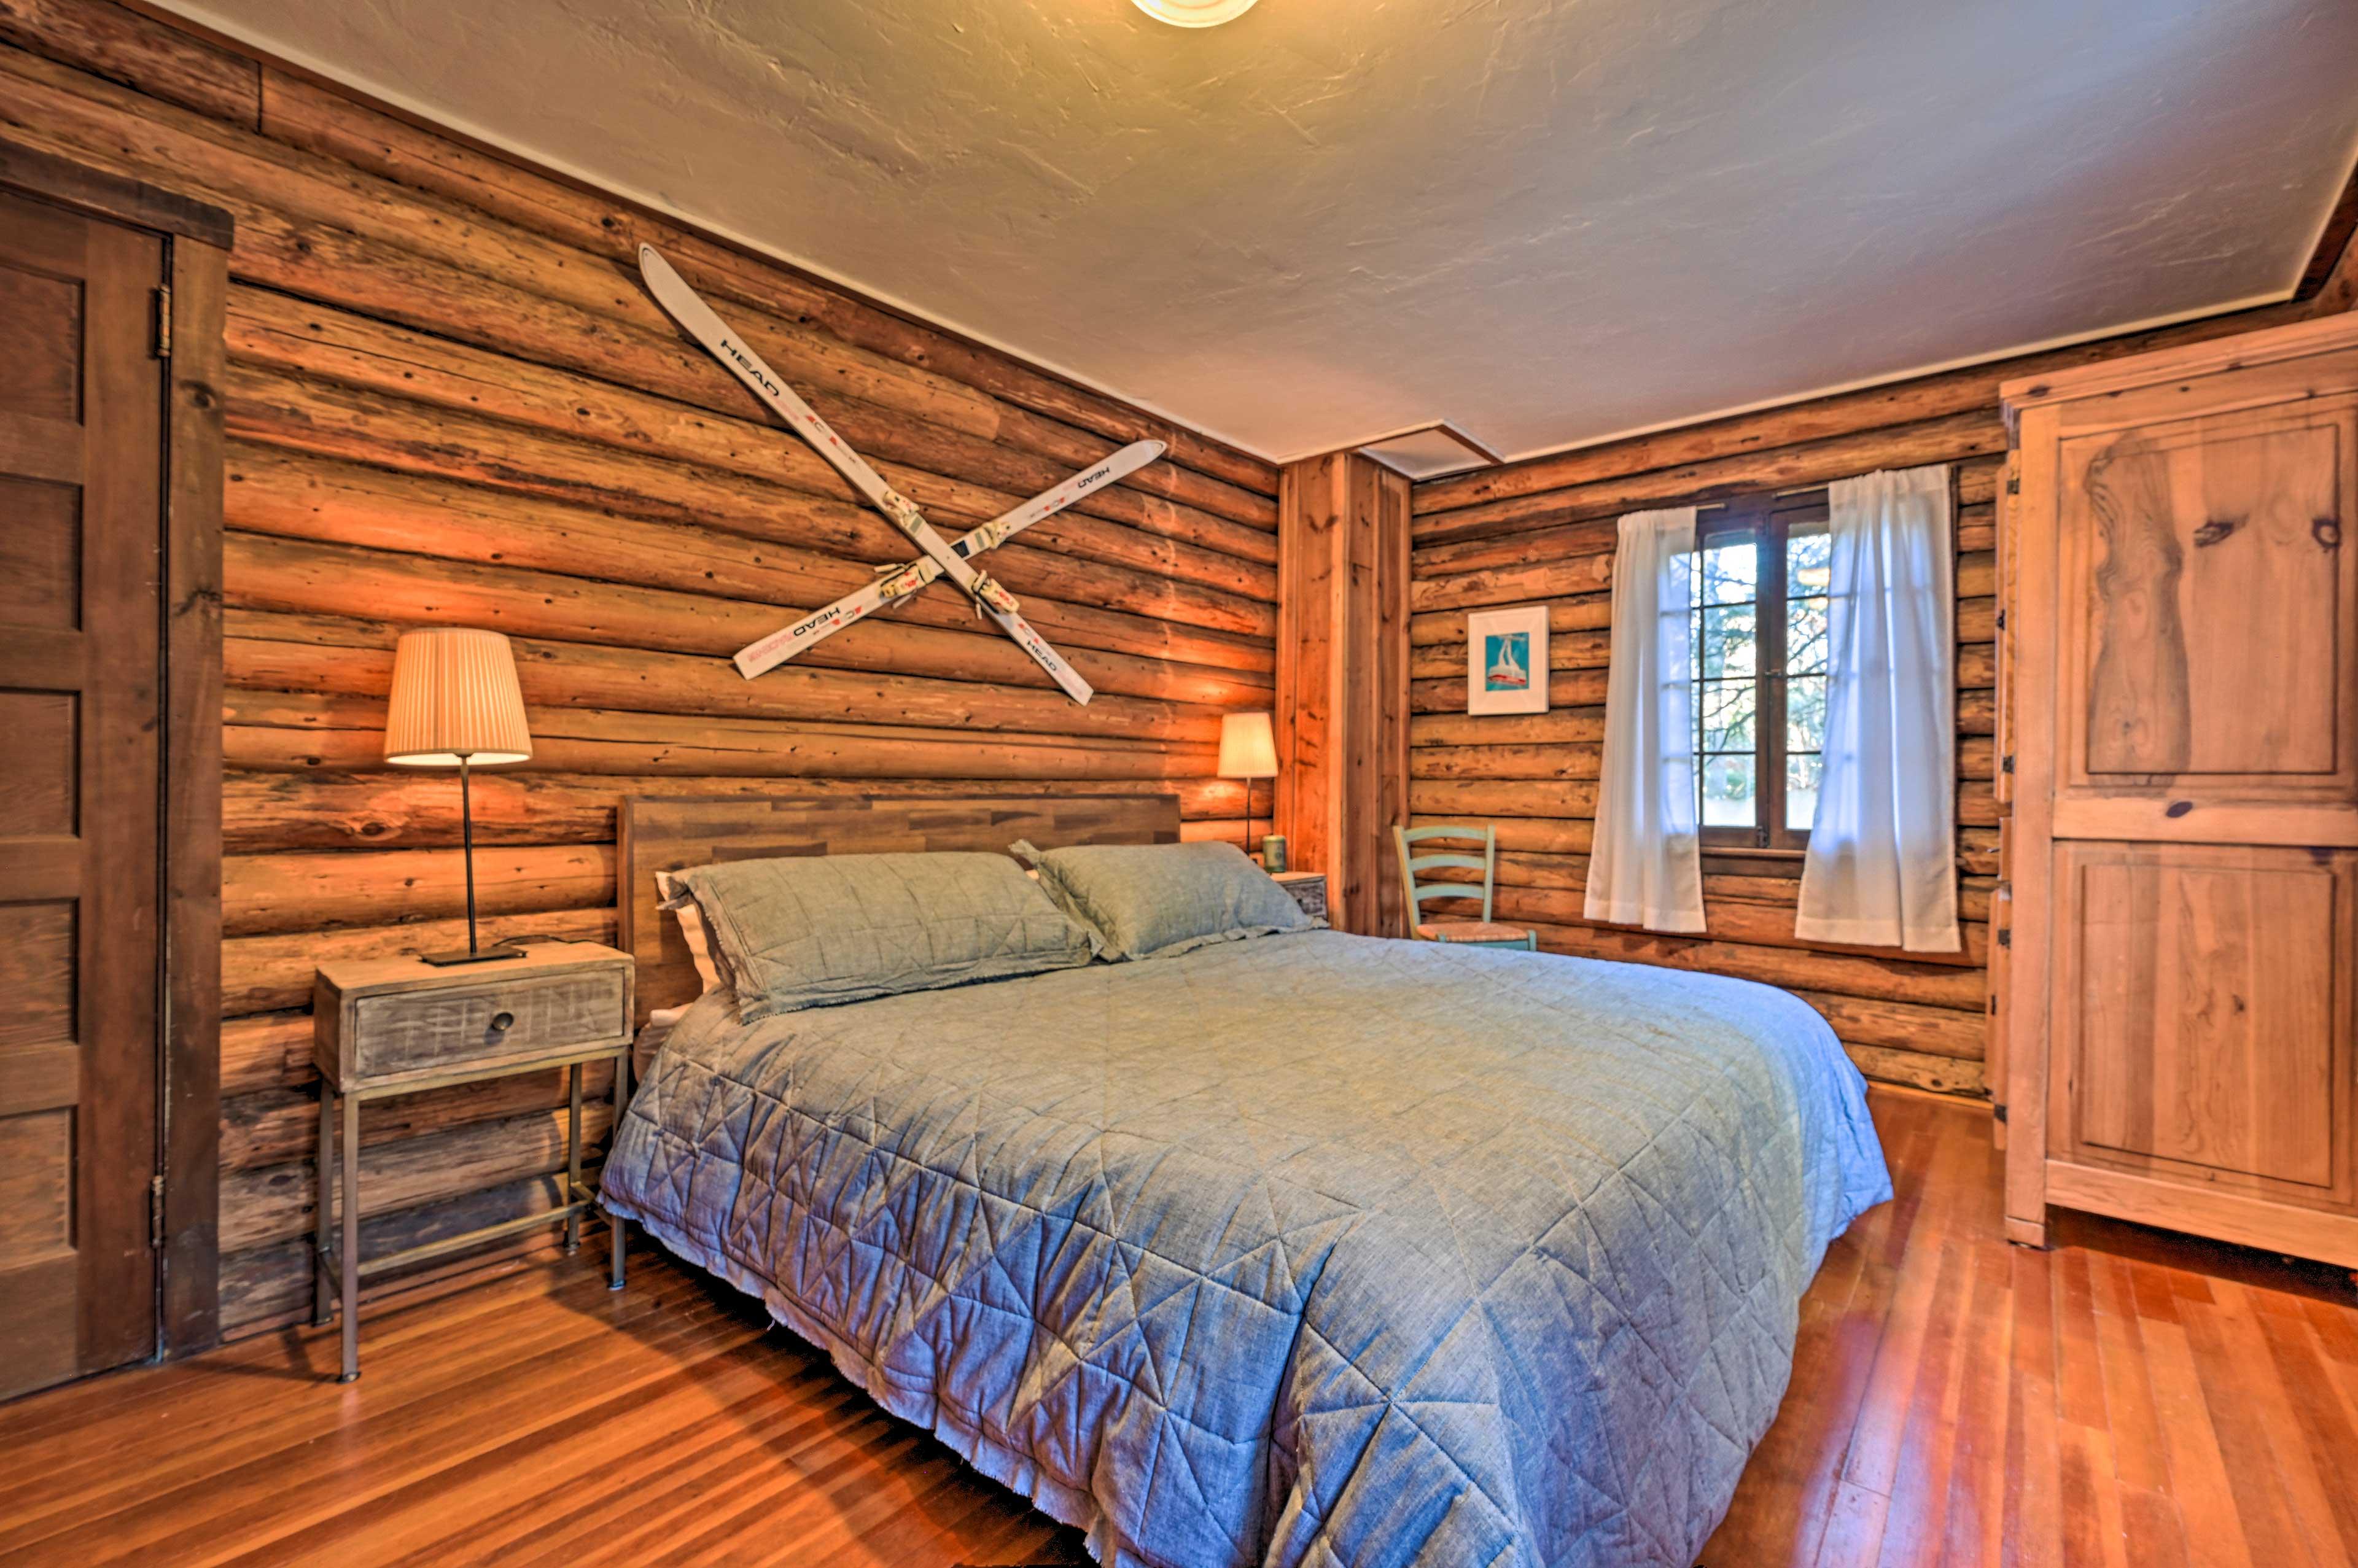 Enjoy a sunlight-filled bedroom each morning in the lower master bedroom!